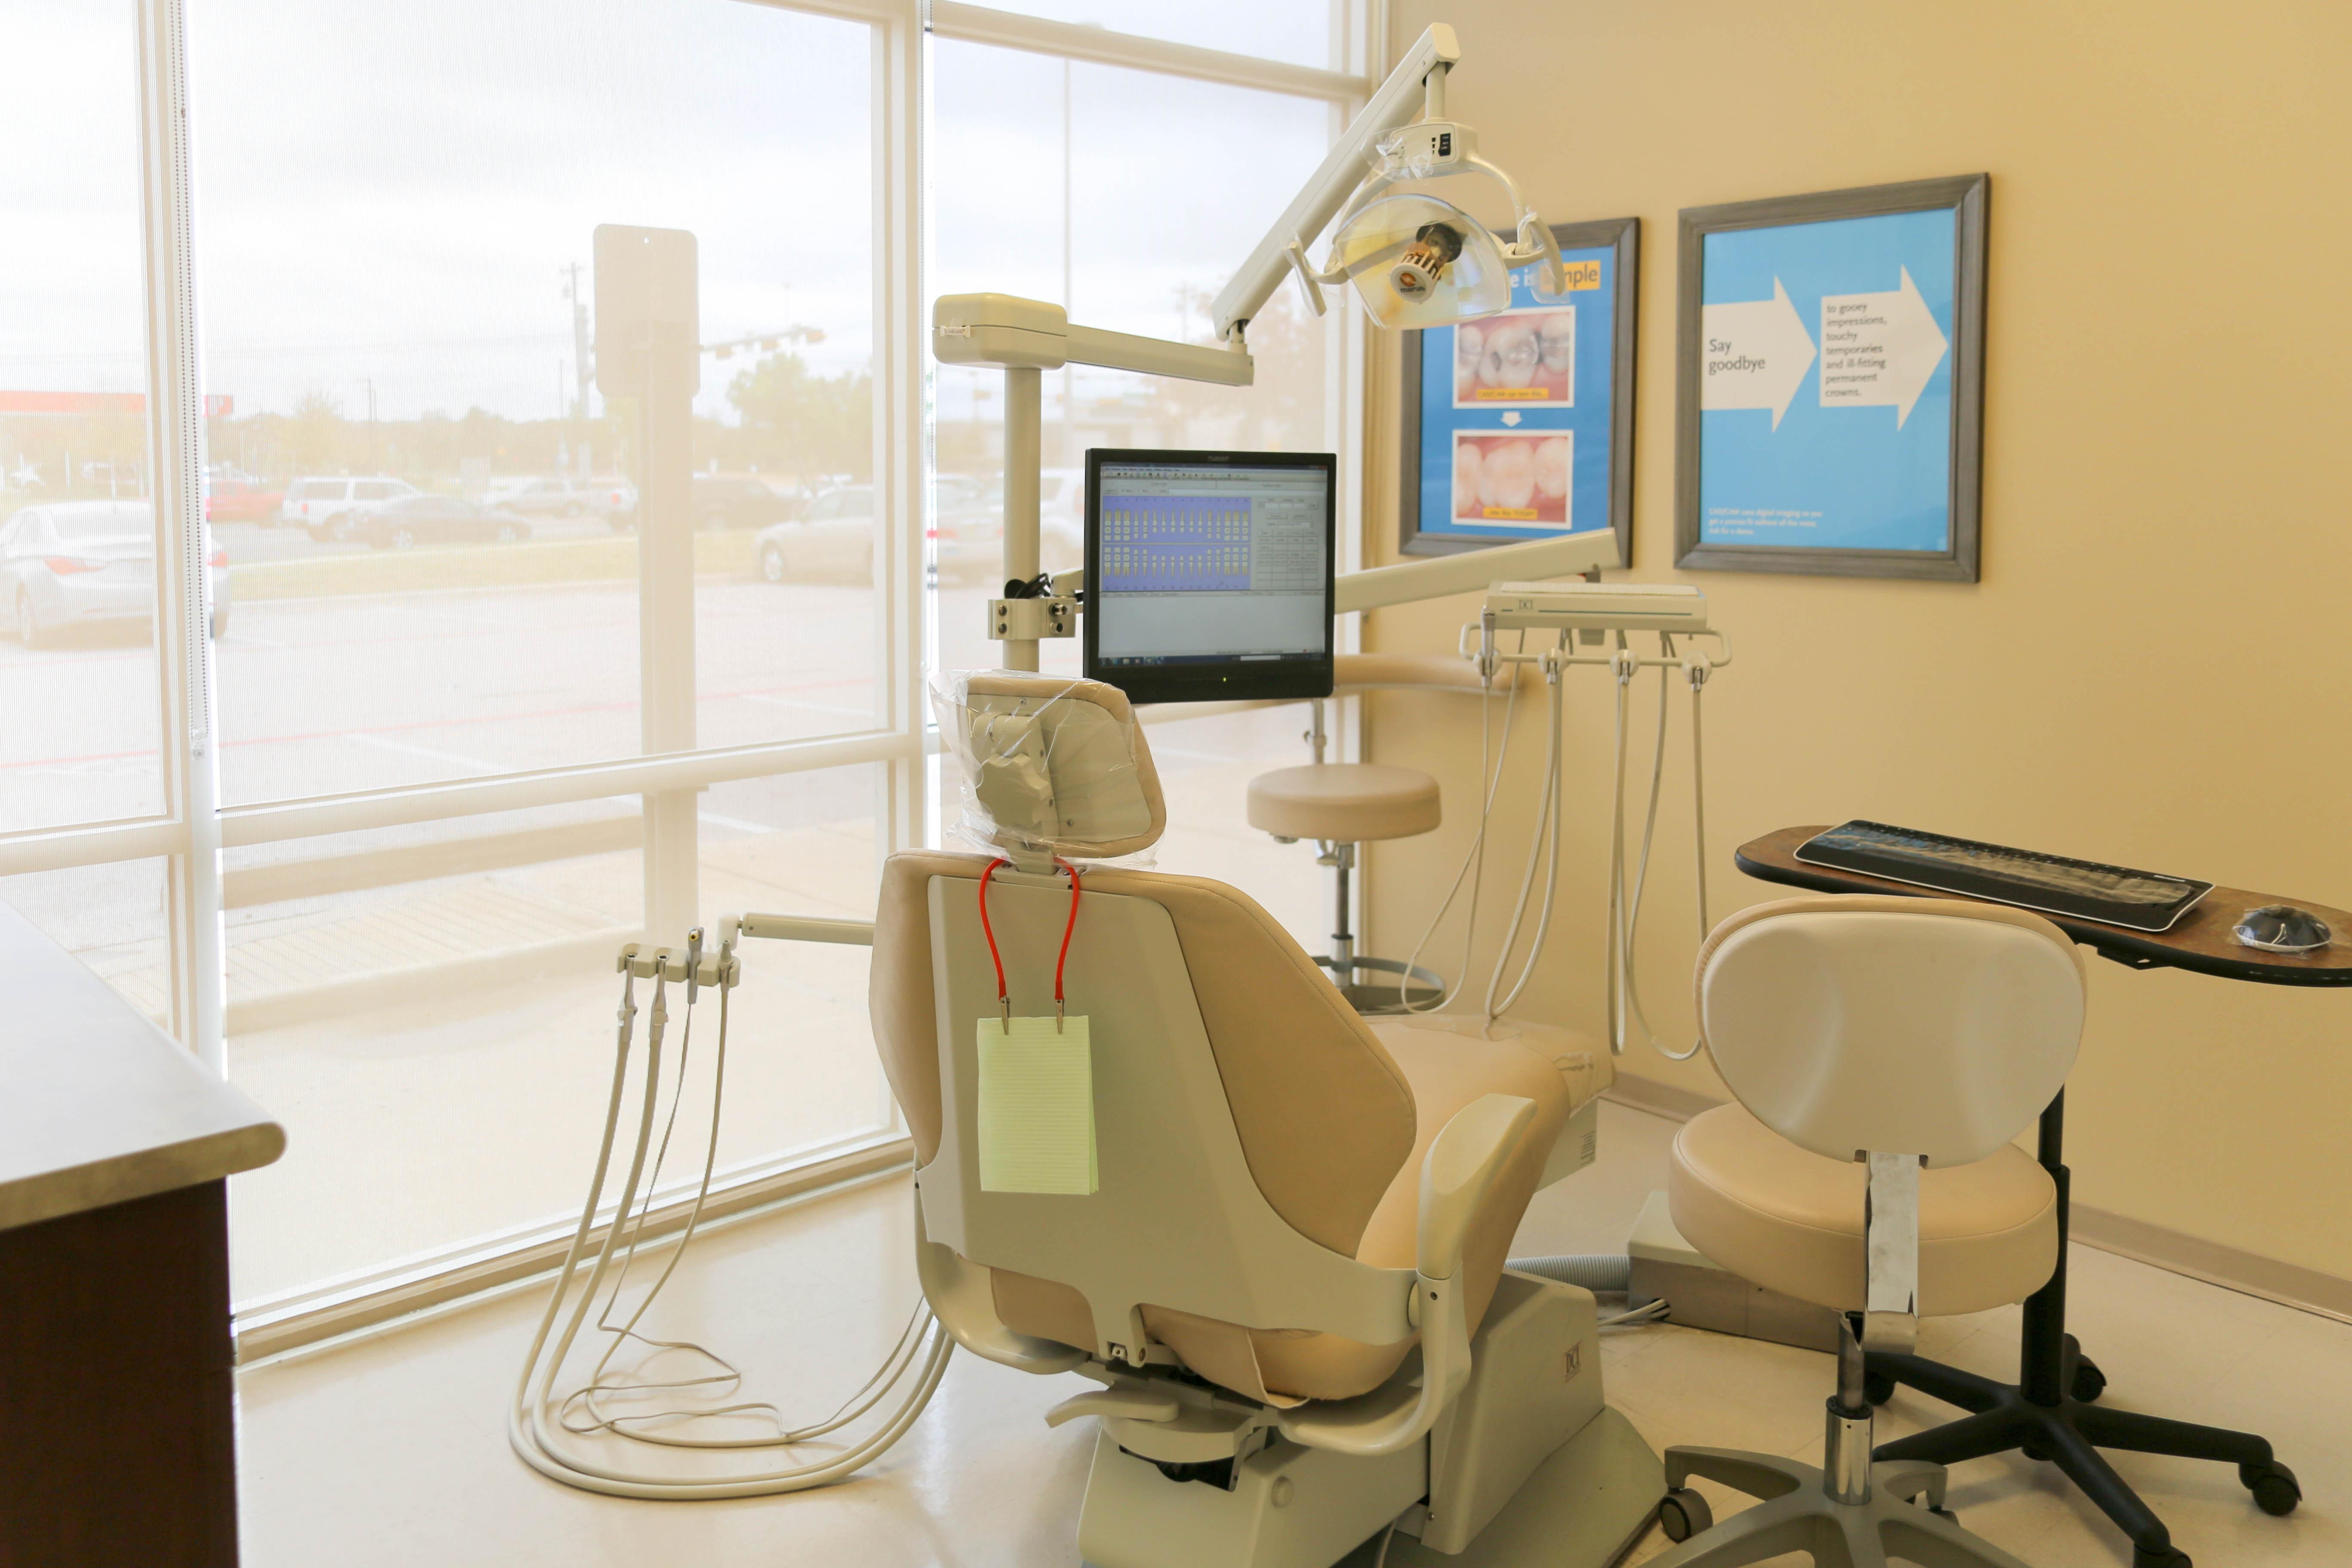 Cedar park modern dentistry and orthodontics in cedar park for James avery jewelry denver co